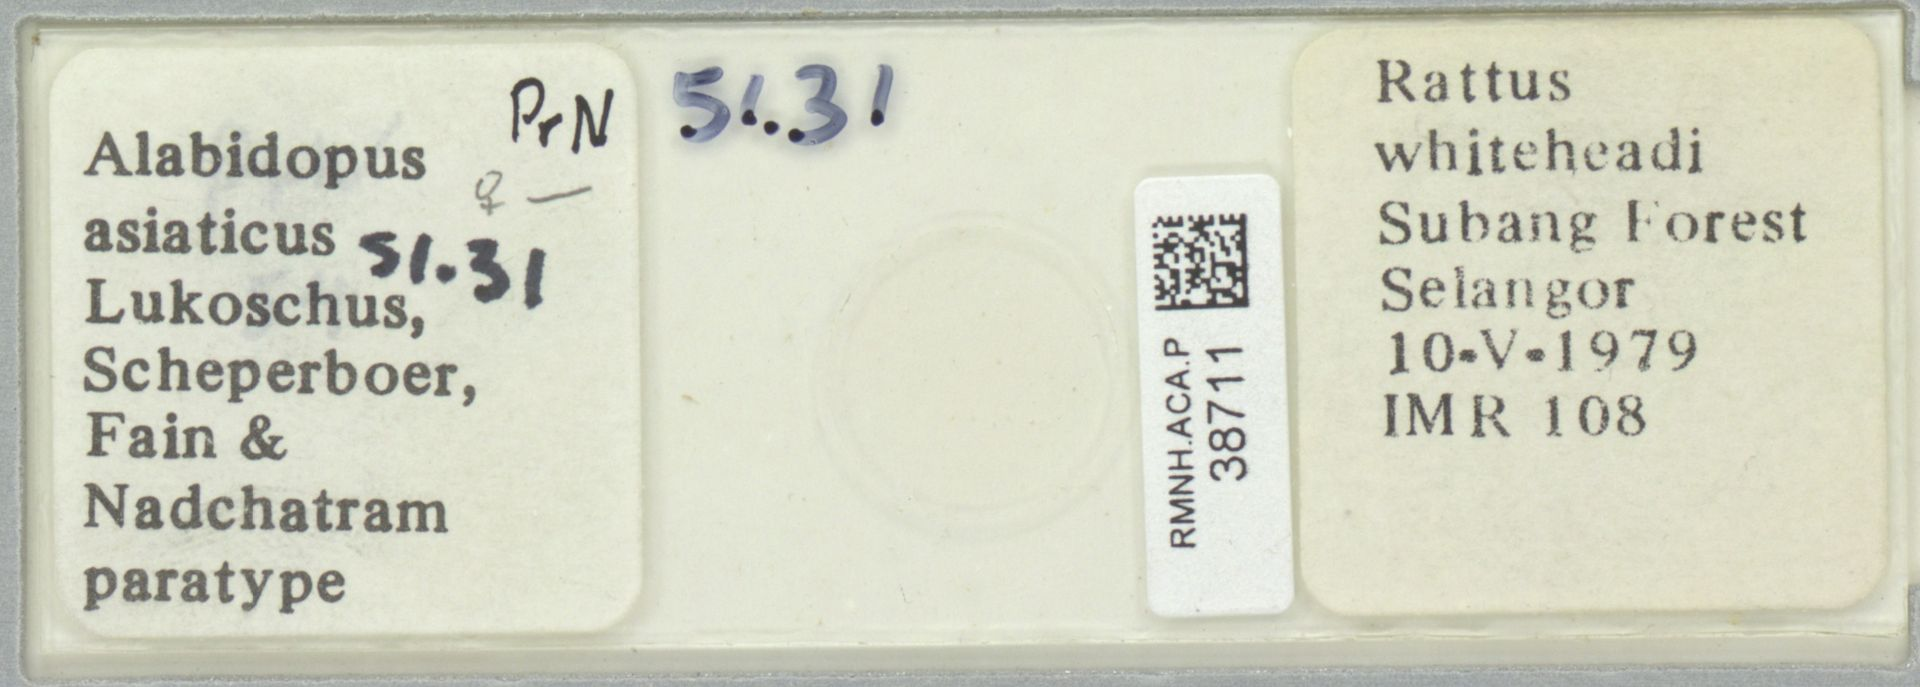 RMNH.ACA.P.38711   Alabidopus asiaticus Lukoschus, Scheperboer, Fain & Nadchatram